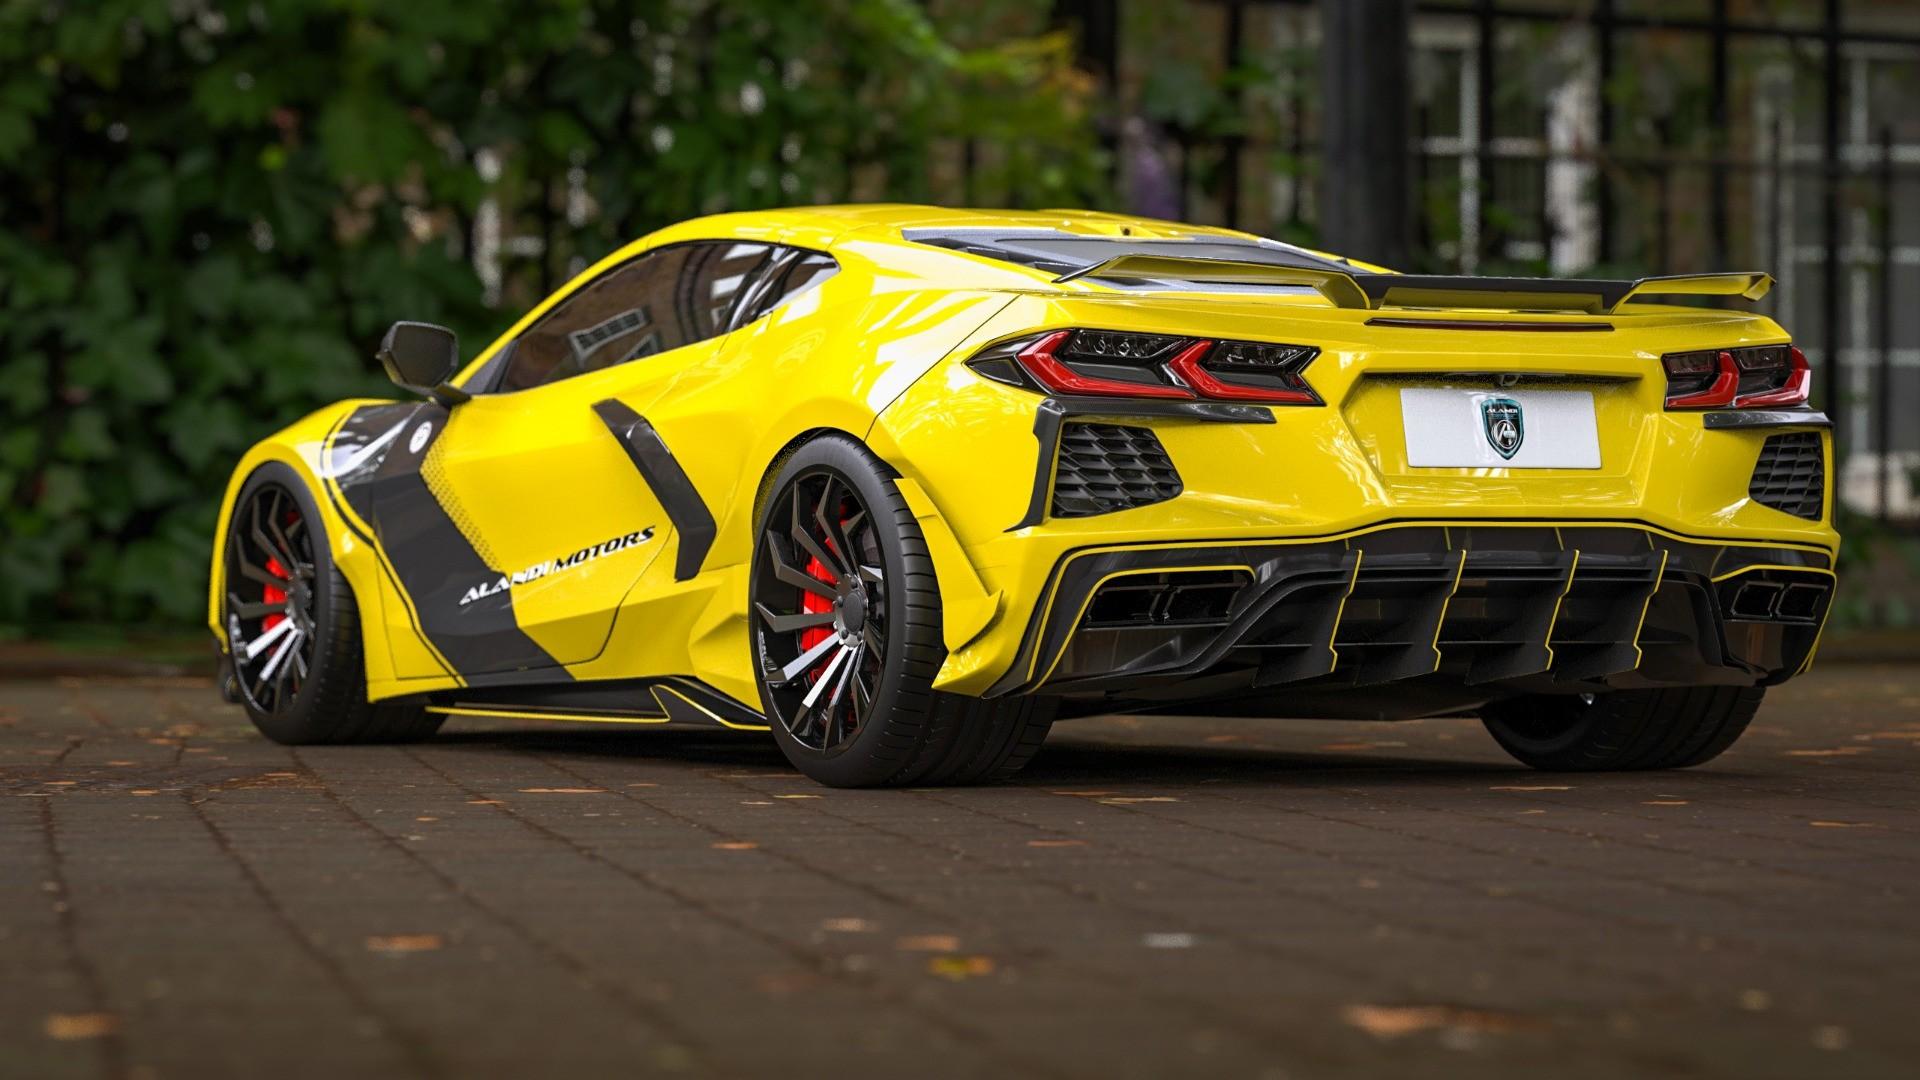 Chevrolet-Corvette-Centurion-by-Alandi-Motors-10